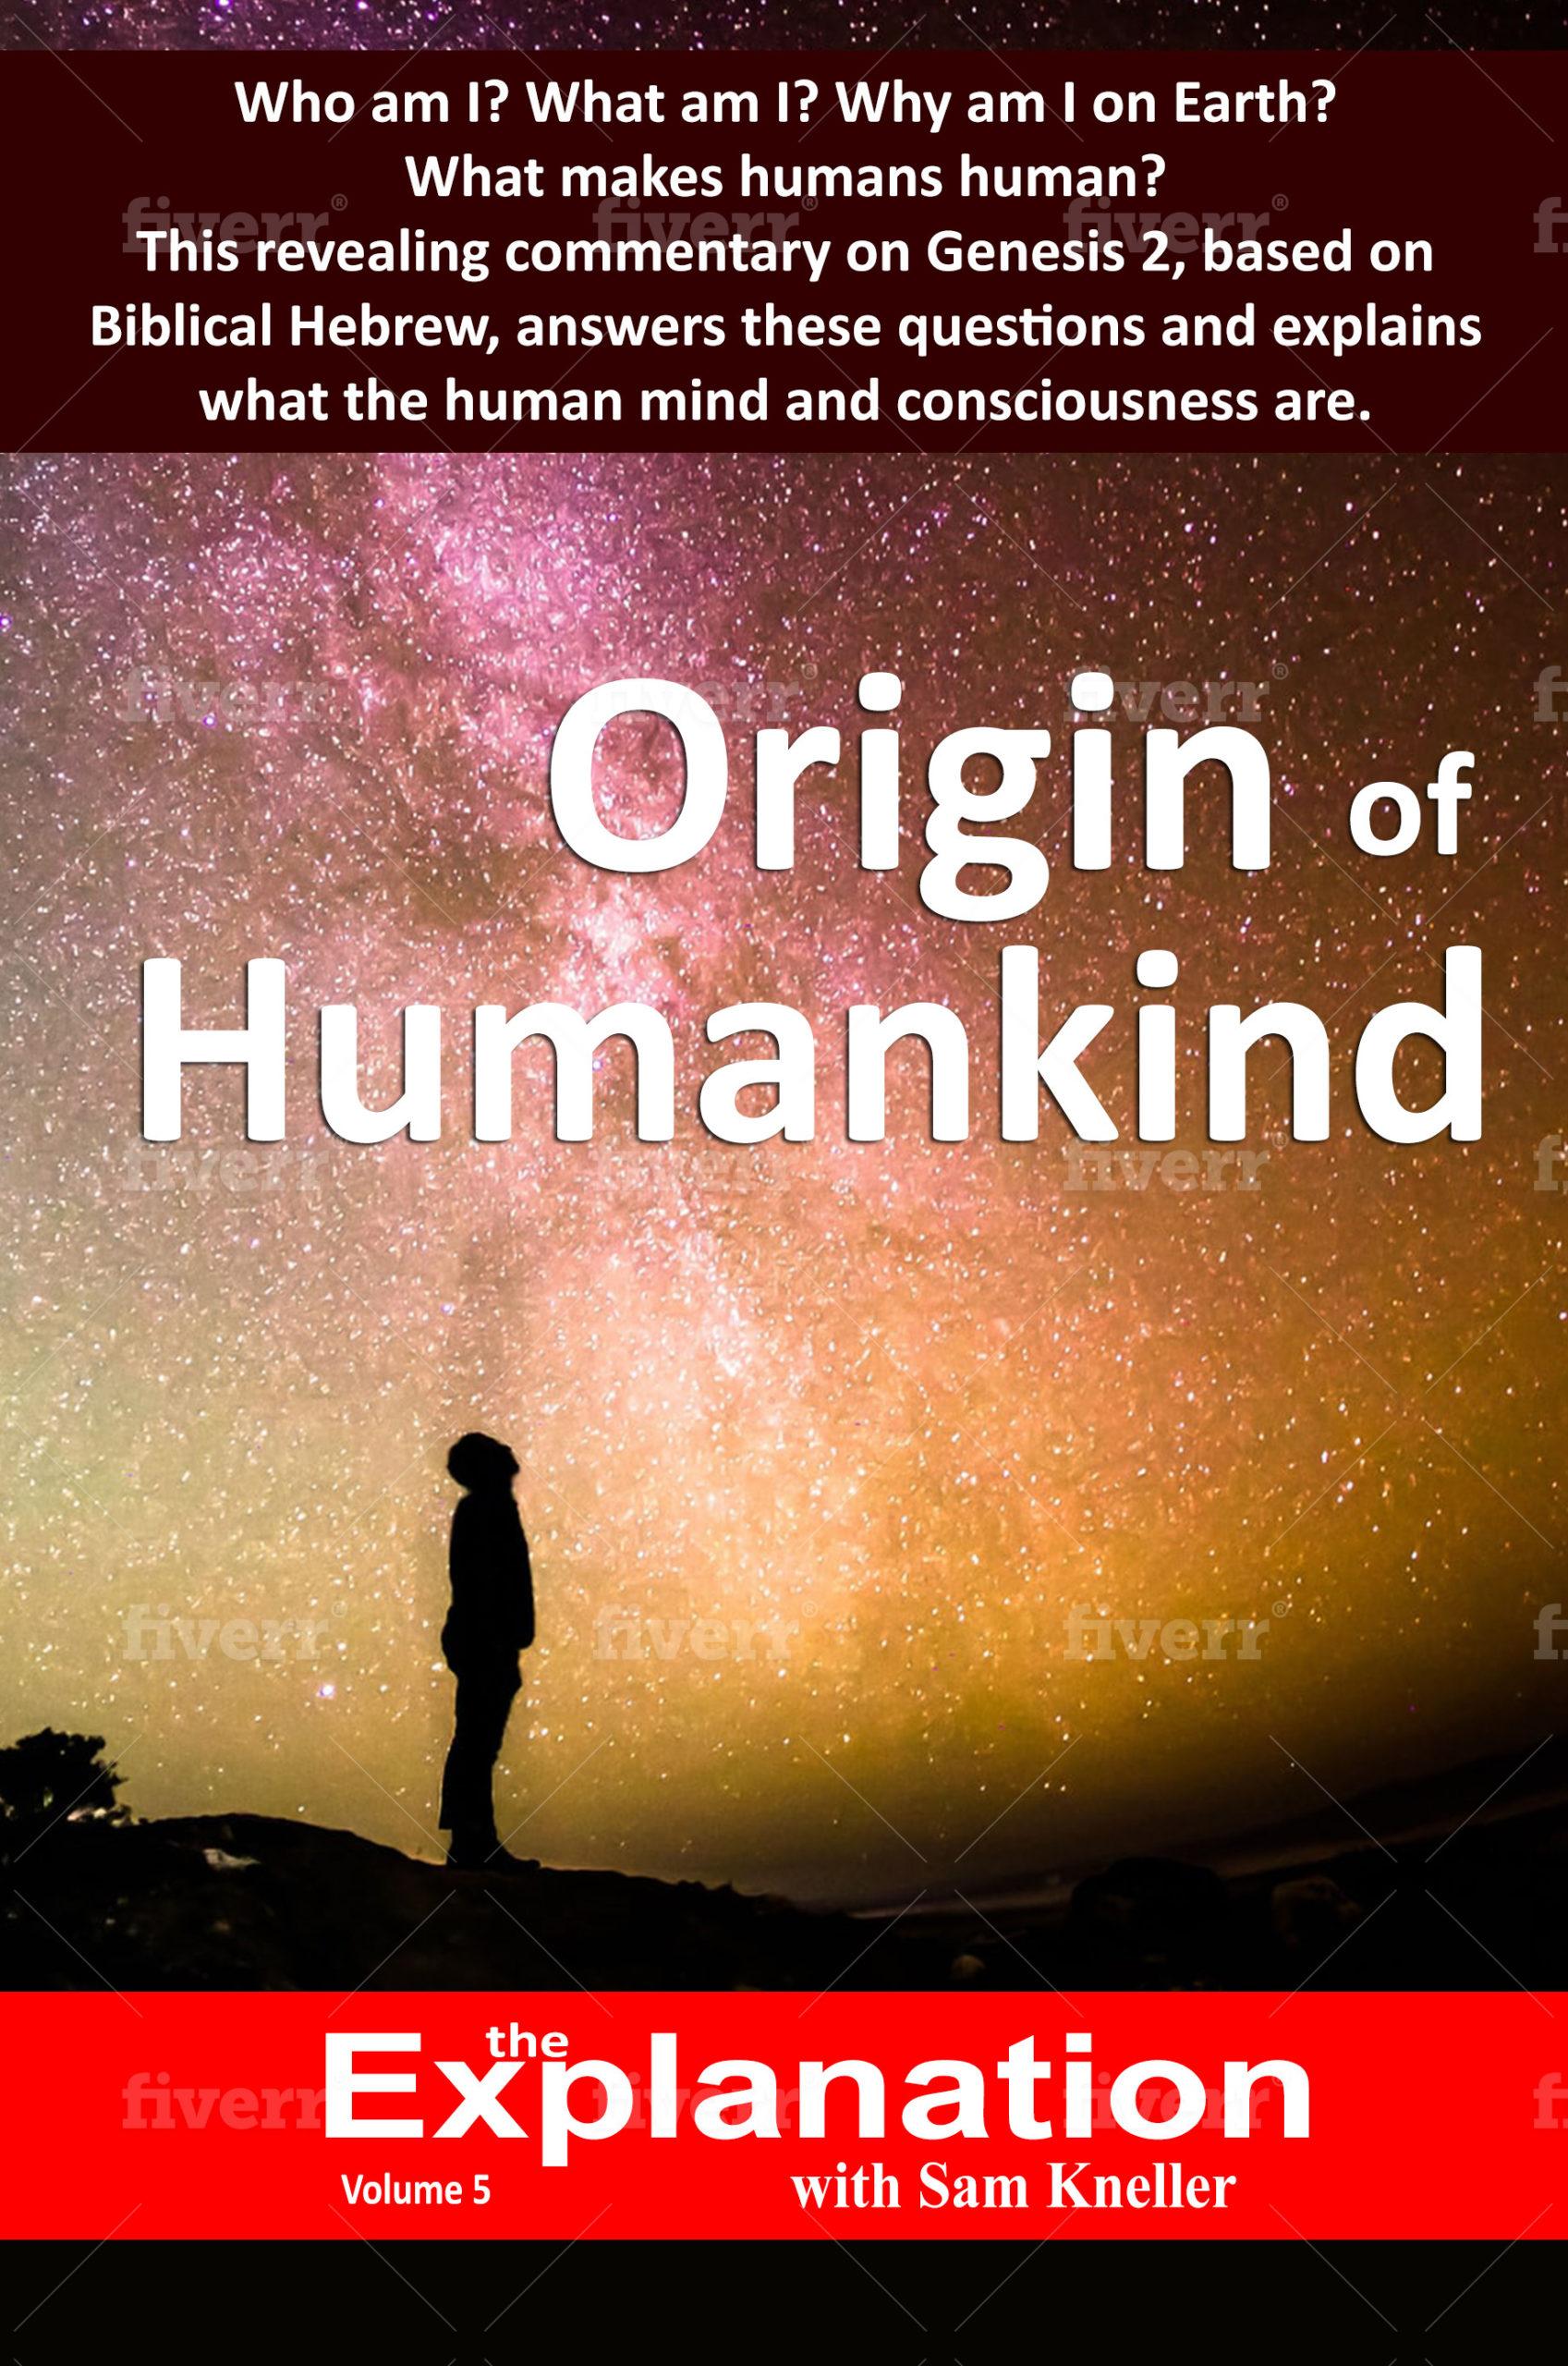 Origin of Humankind book cover